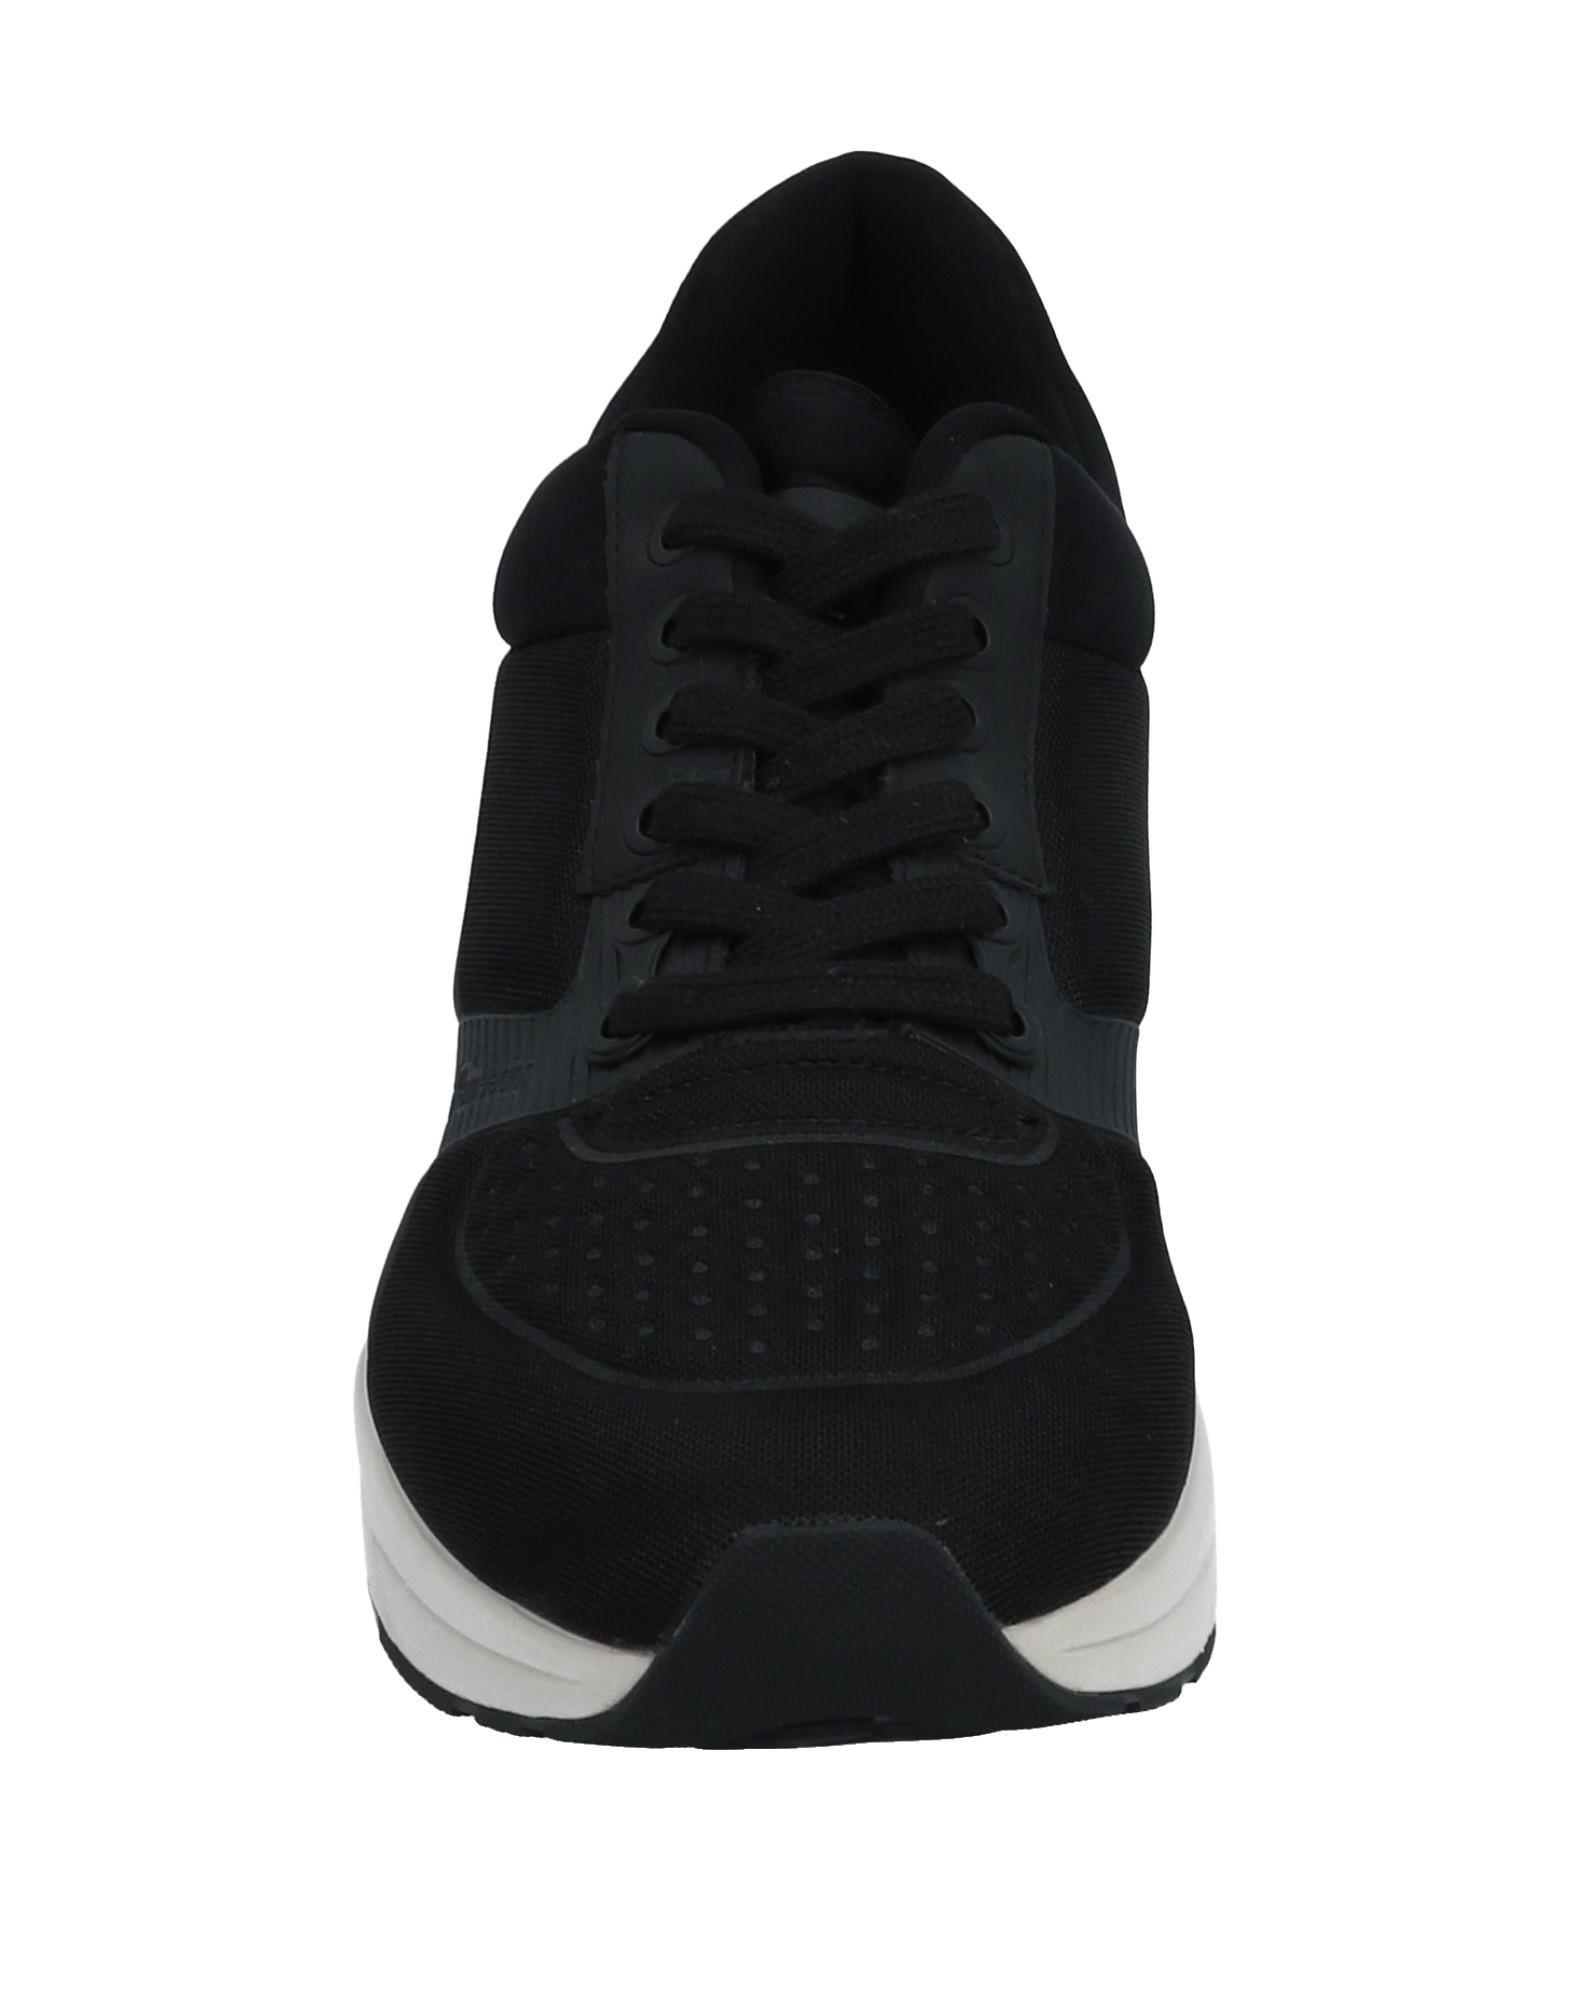 Calvin Klein Jeans Sneakers Jeans - Men Calvin Klein Jeans Sneakers Sneakers online on  Australia - 11517382OH 6d1978